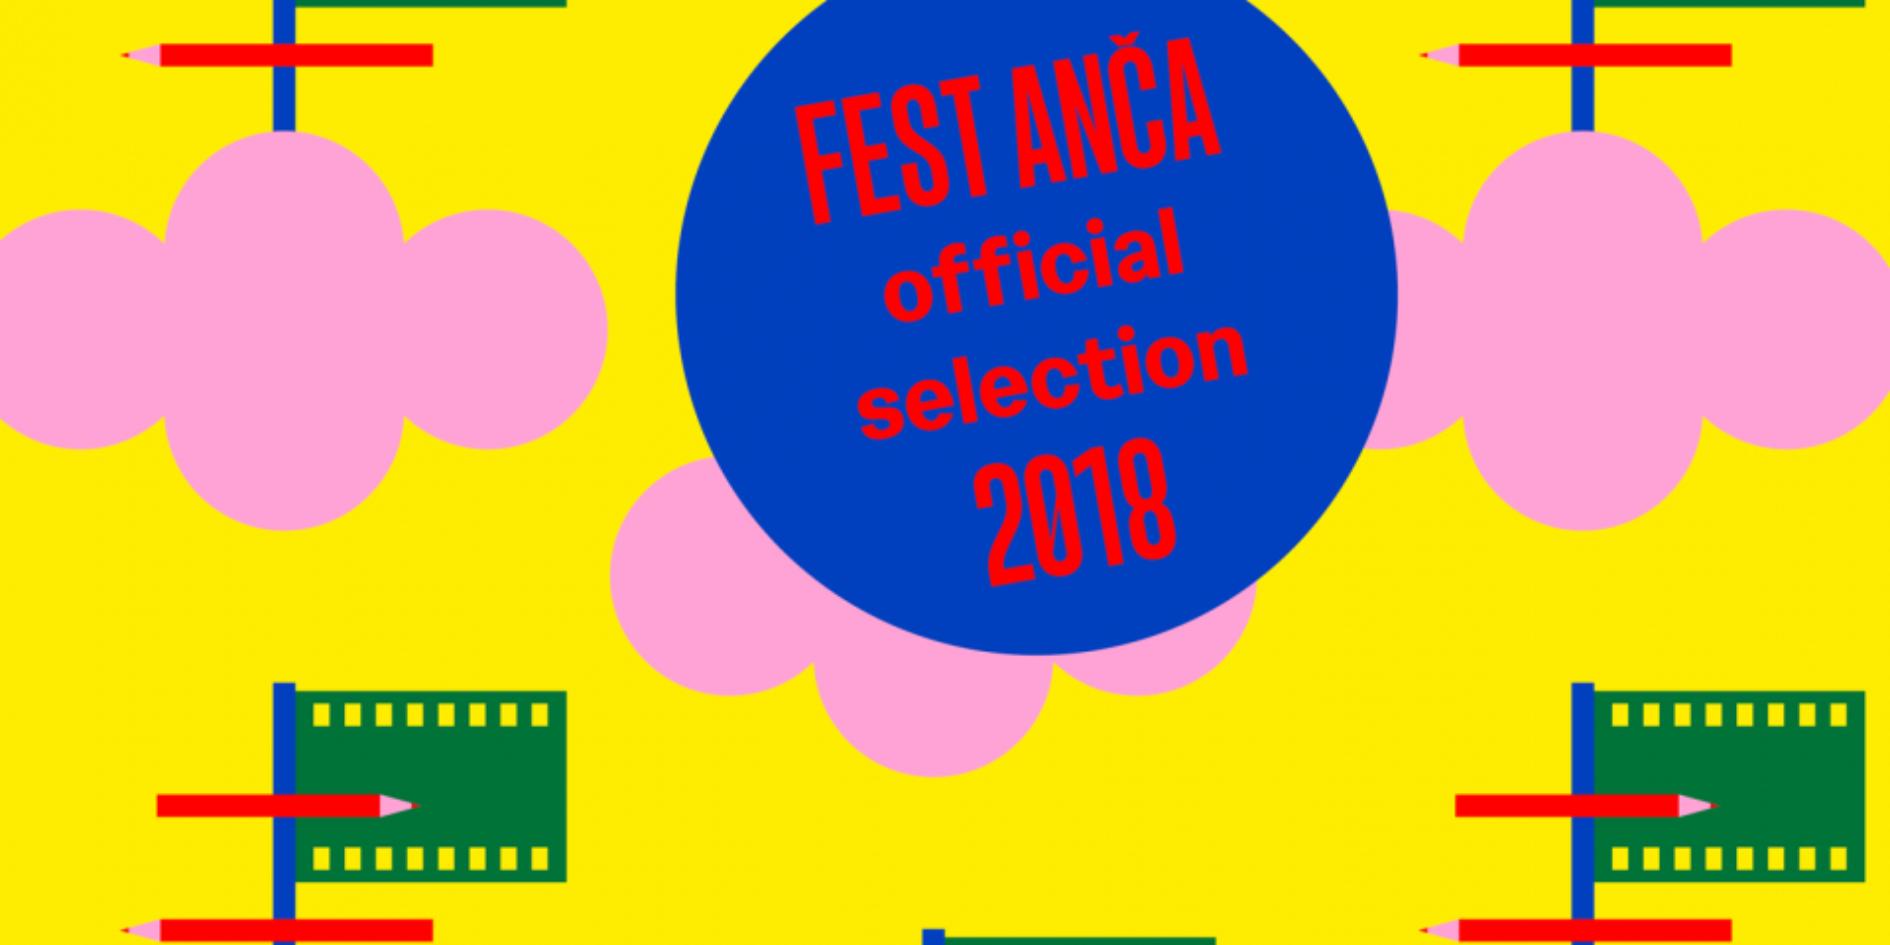 the Fest Anca International Animation Festival